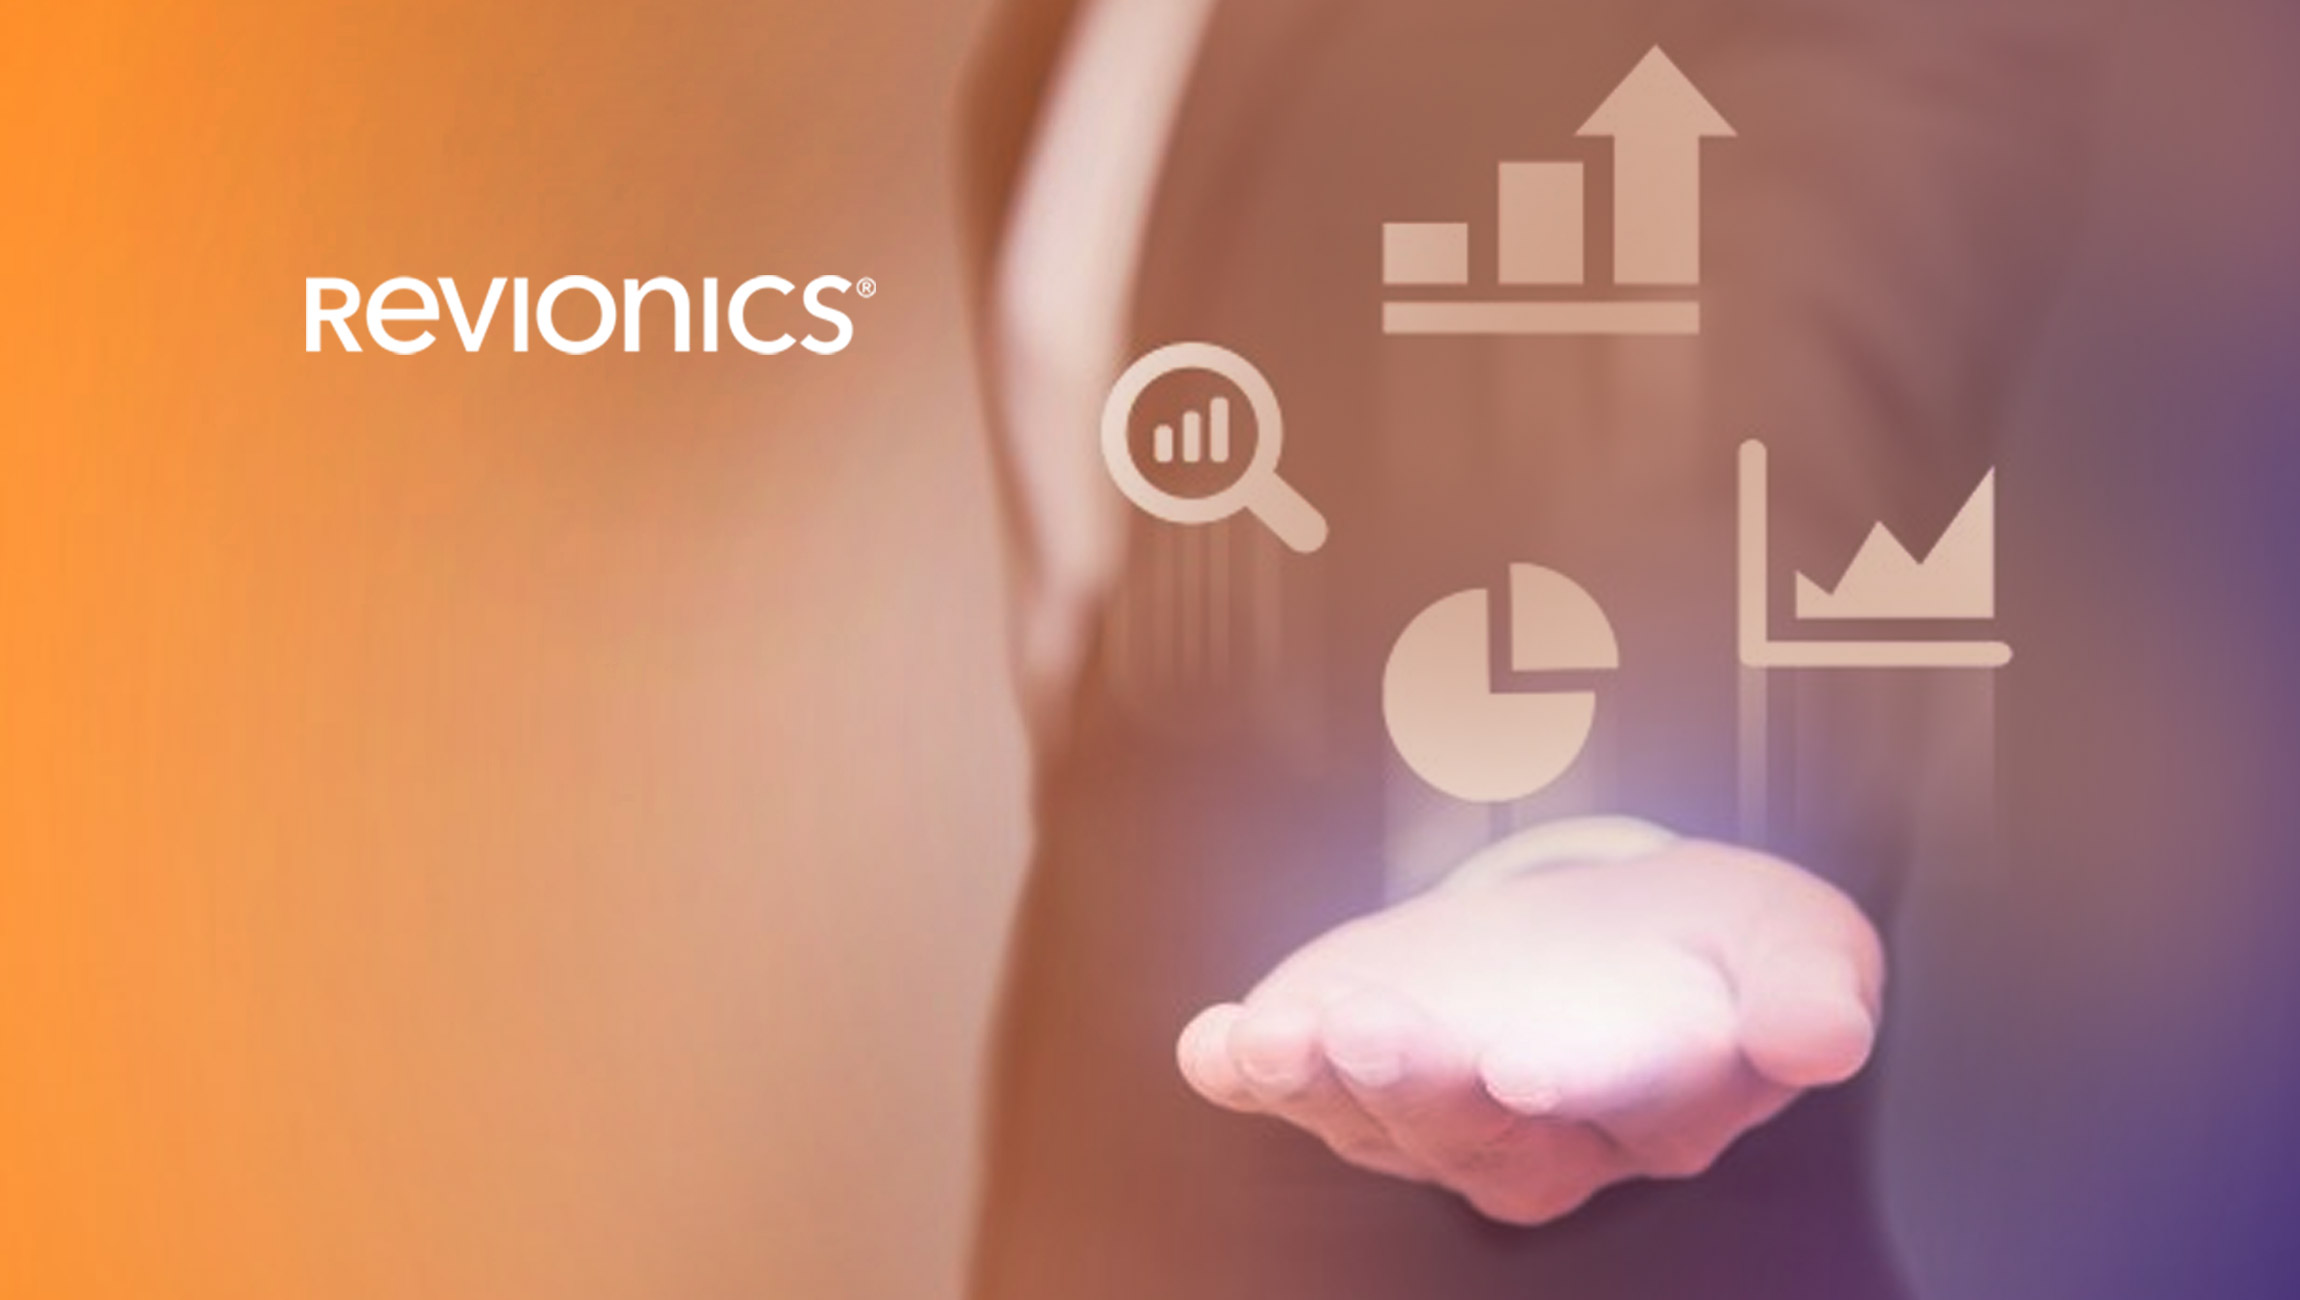 Shop Direct Enhances Customer Engagement, Revenues with Revionics AI-Based Price Optimization